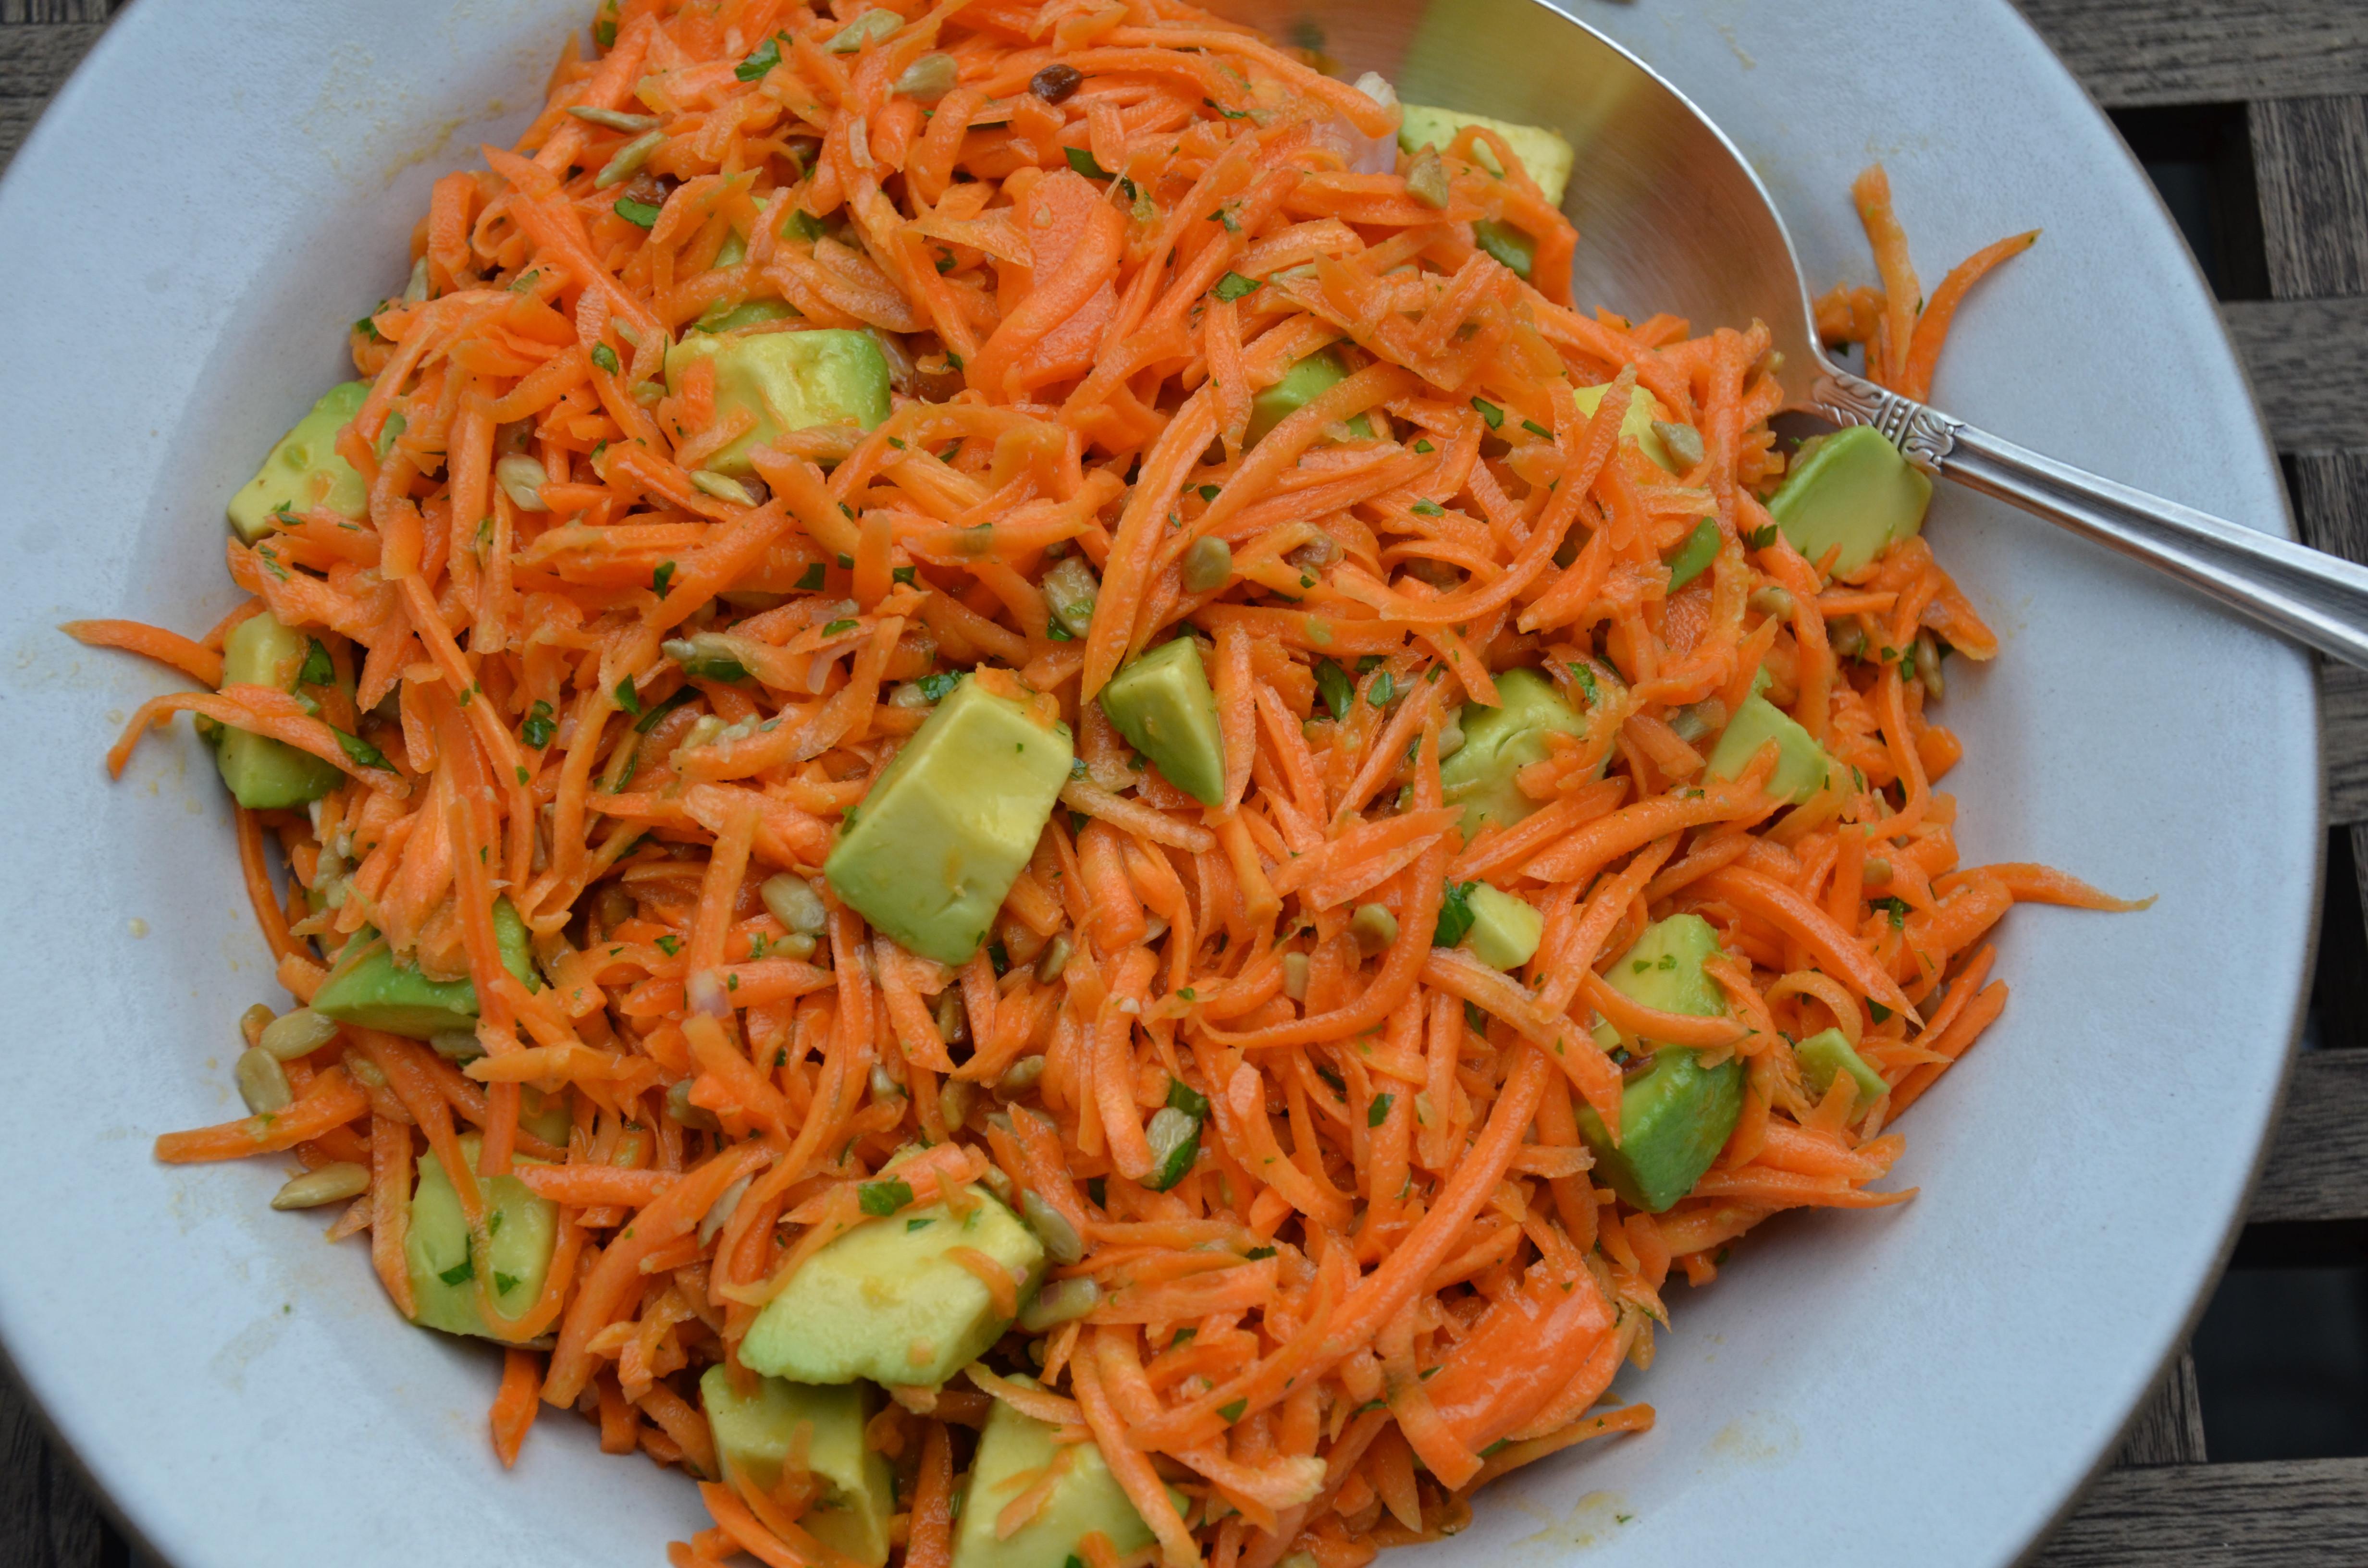 Carrot Salad Recipes  carrot salad with avocado recipe